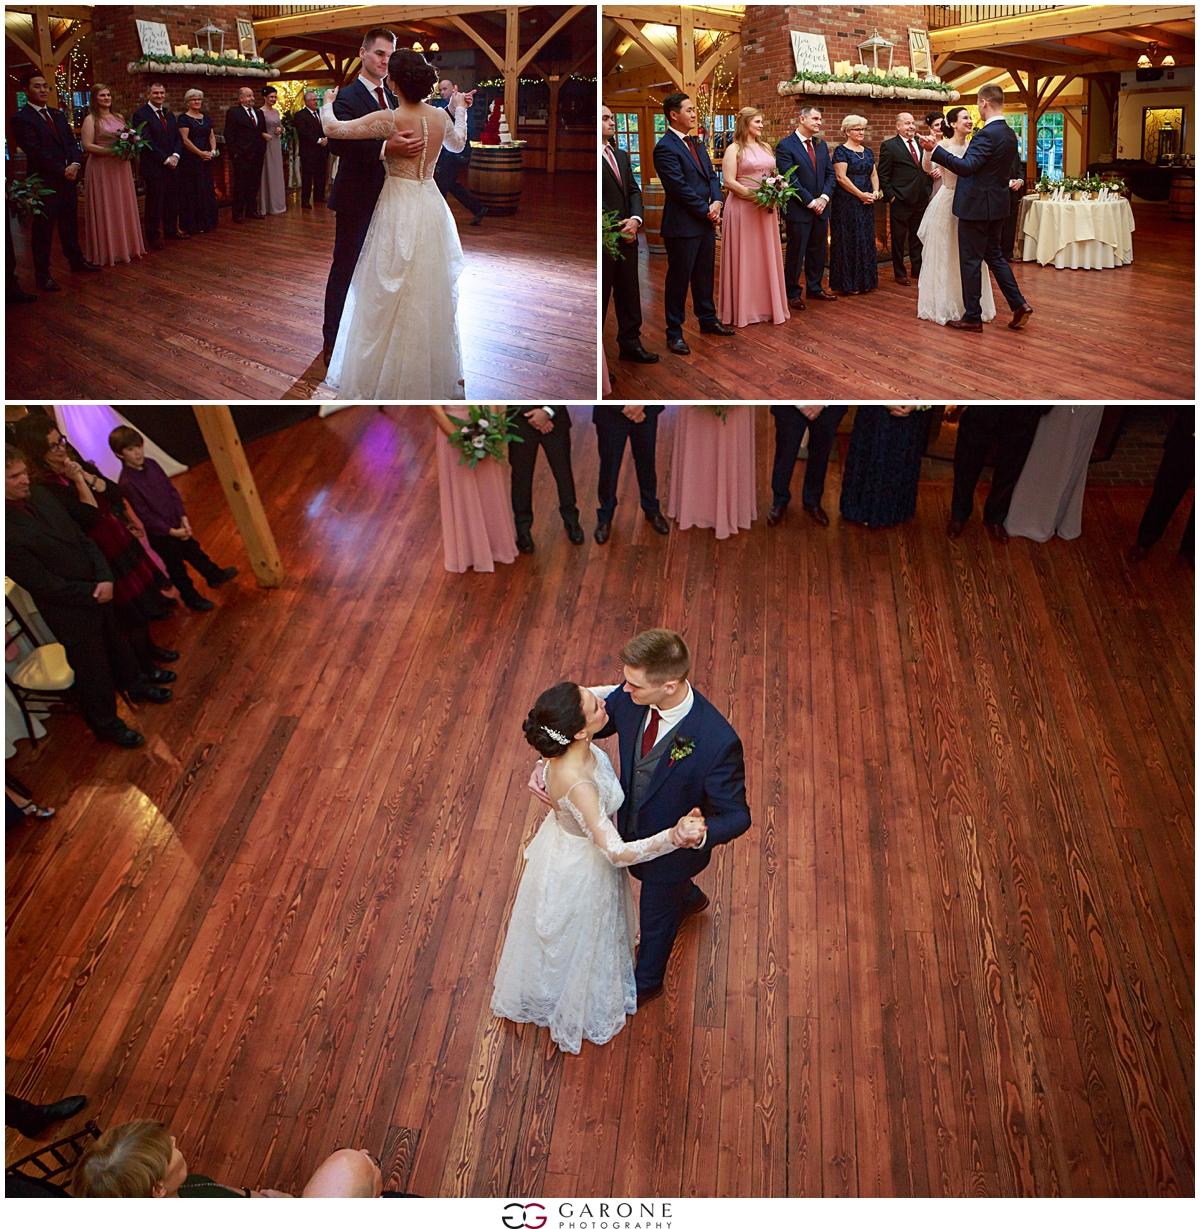 Rachel_Josh_Zorvinos_Wedding_NH_Wedding_Photography_Garone_Photography_Fall_Foliage_Wedding_0040.jpg